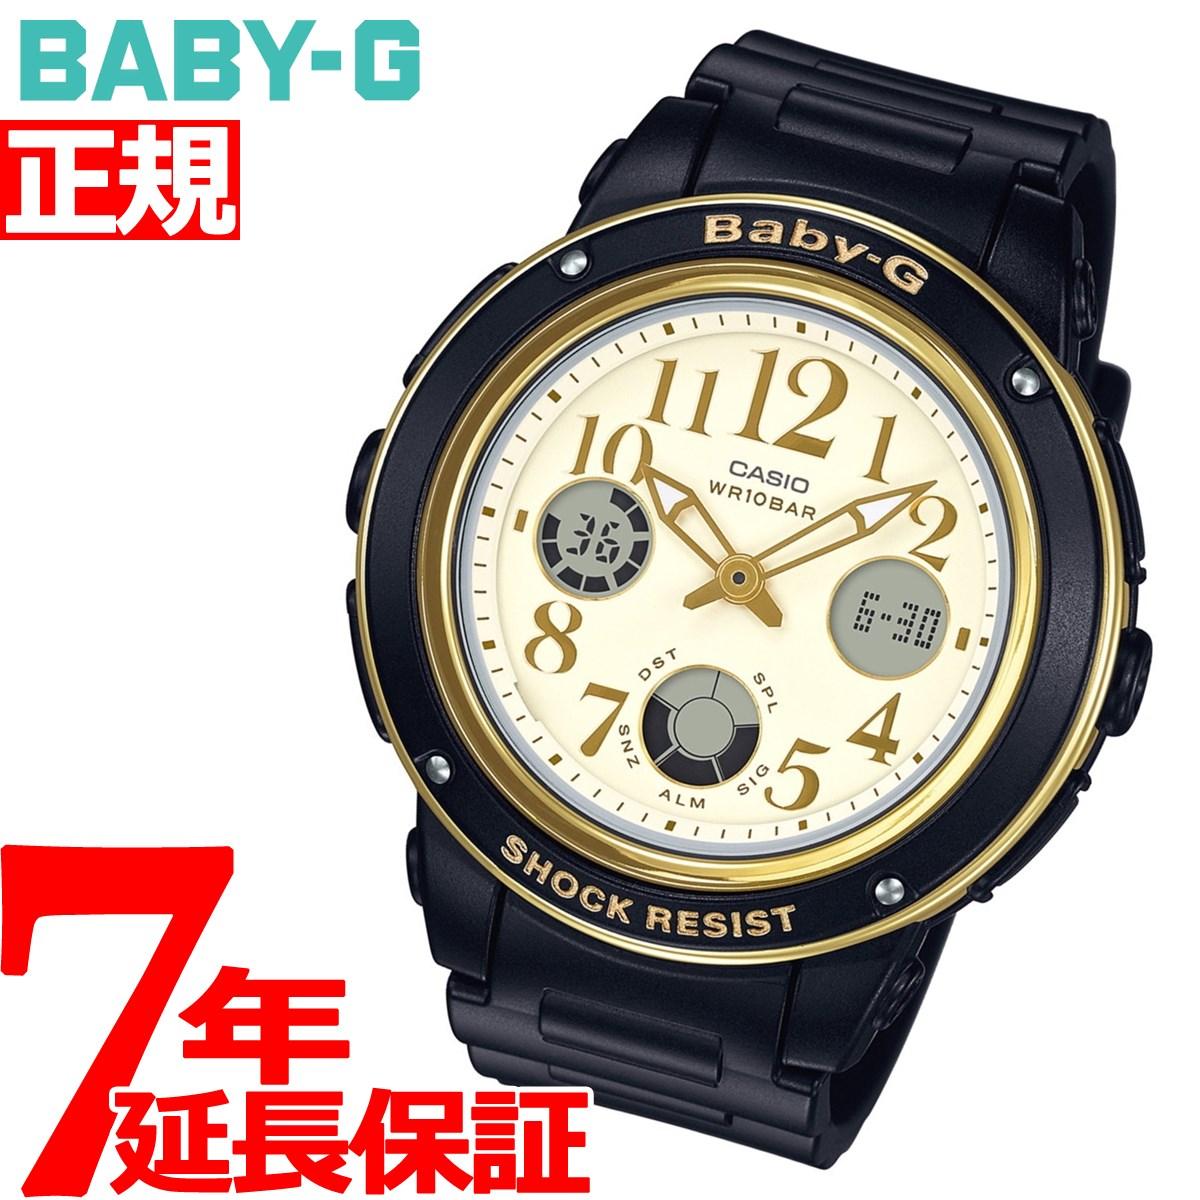 CASIO BABY-G カシオ ベビーG 腕時計 レディース ブラック アナデジ BGA-151EF-1BJF